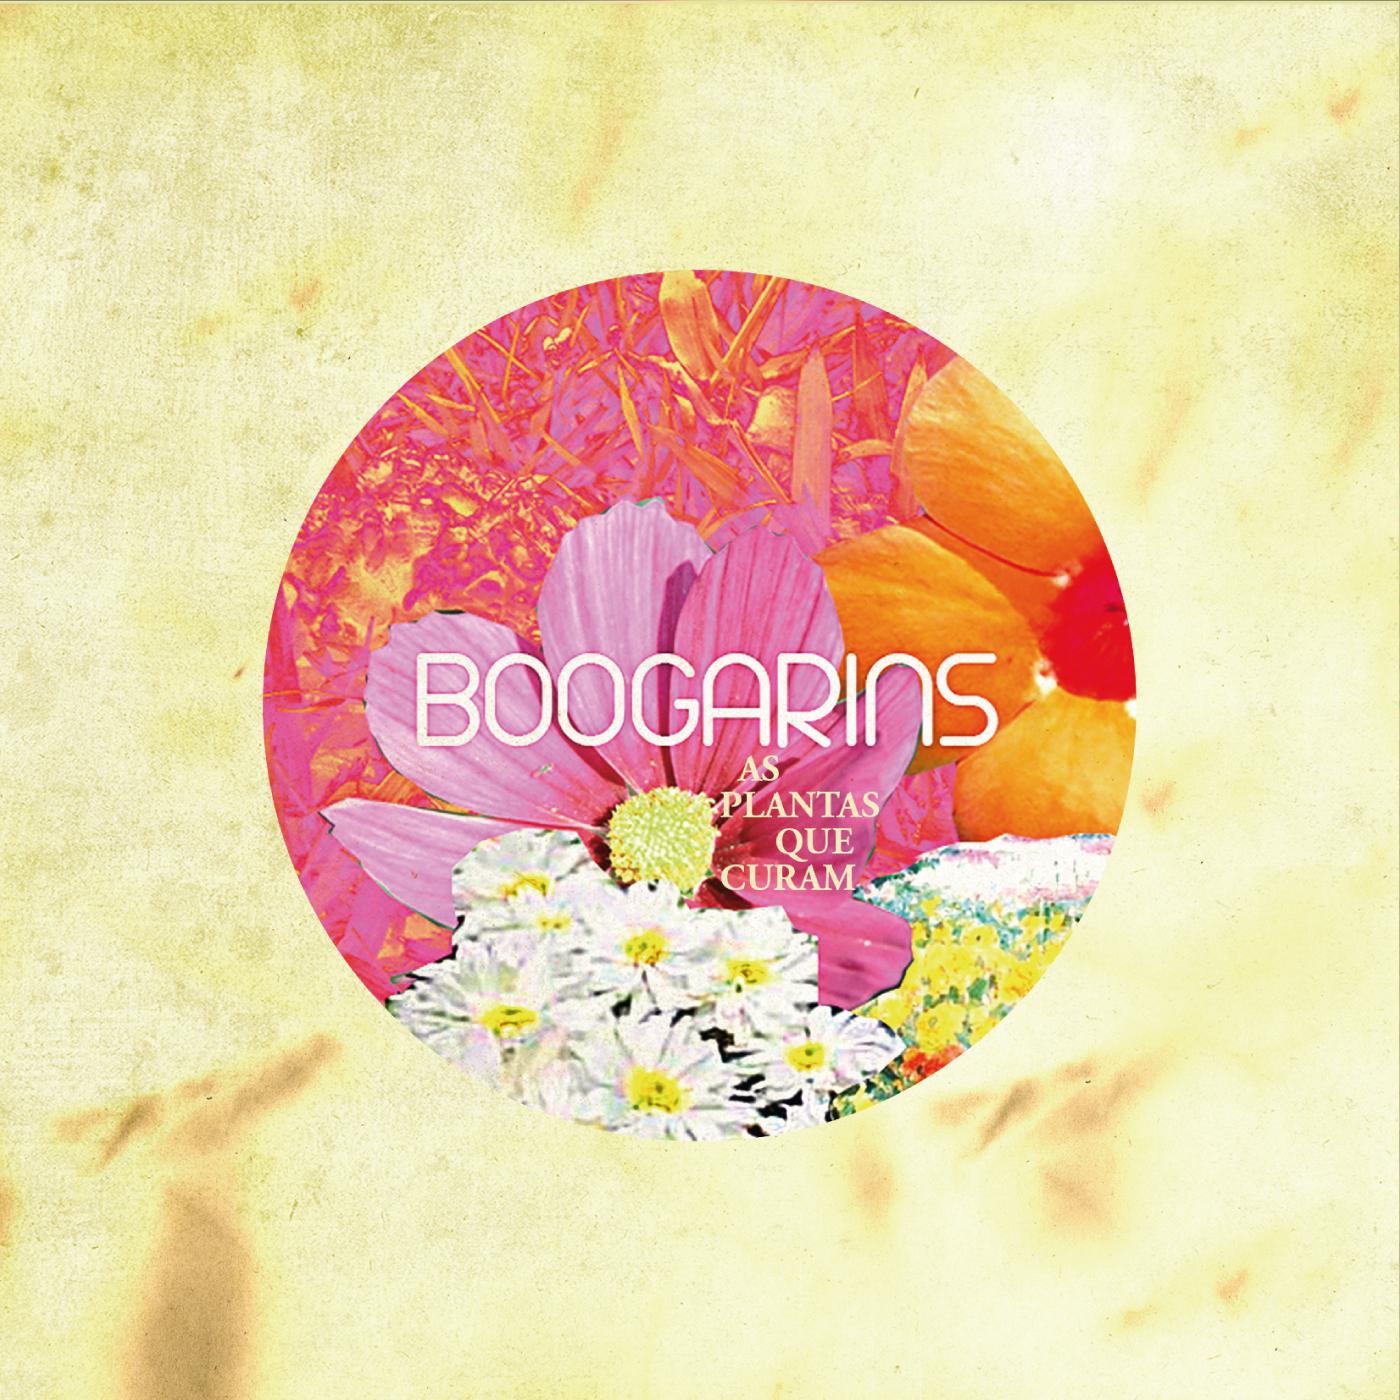 Capa - Boogarins - Plantas que Curam